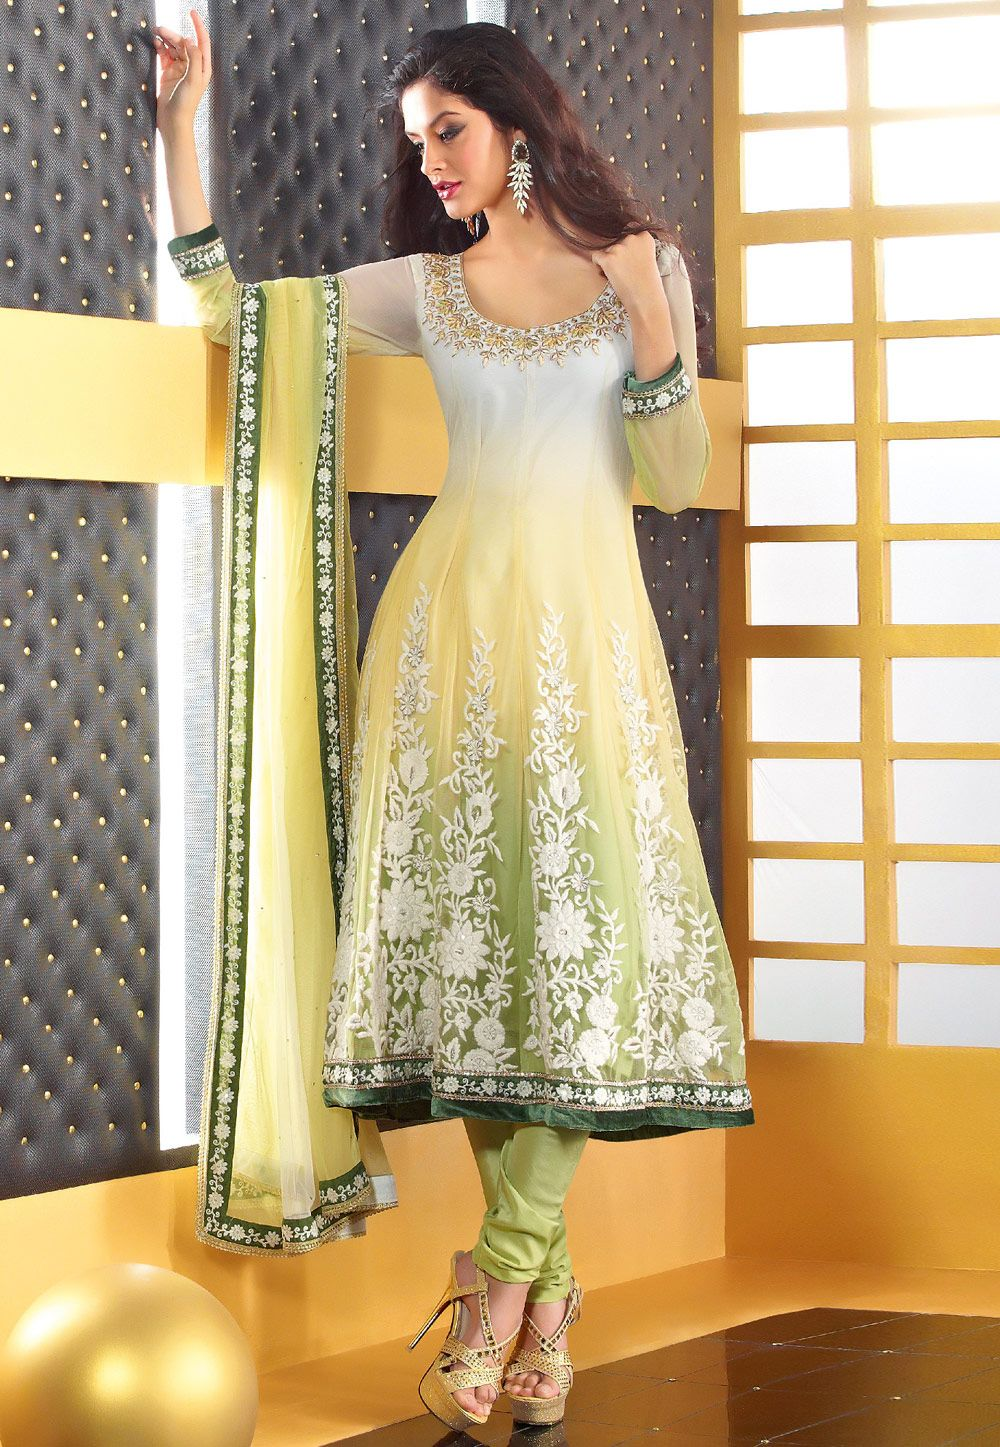 cf7fa7ed0c Off White, Yellow and Pista Green Anarkali Net Churidar Kameez @ $140.15